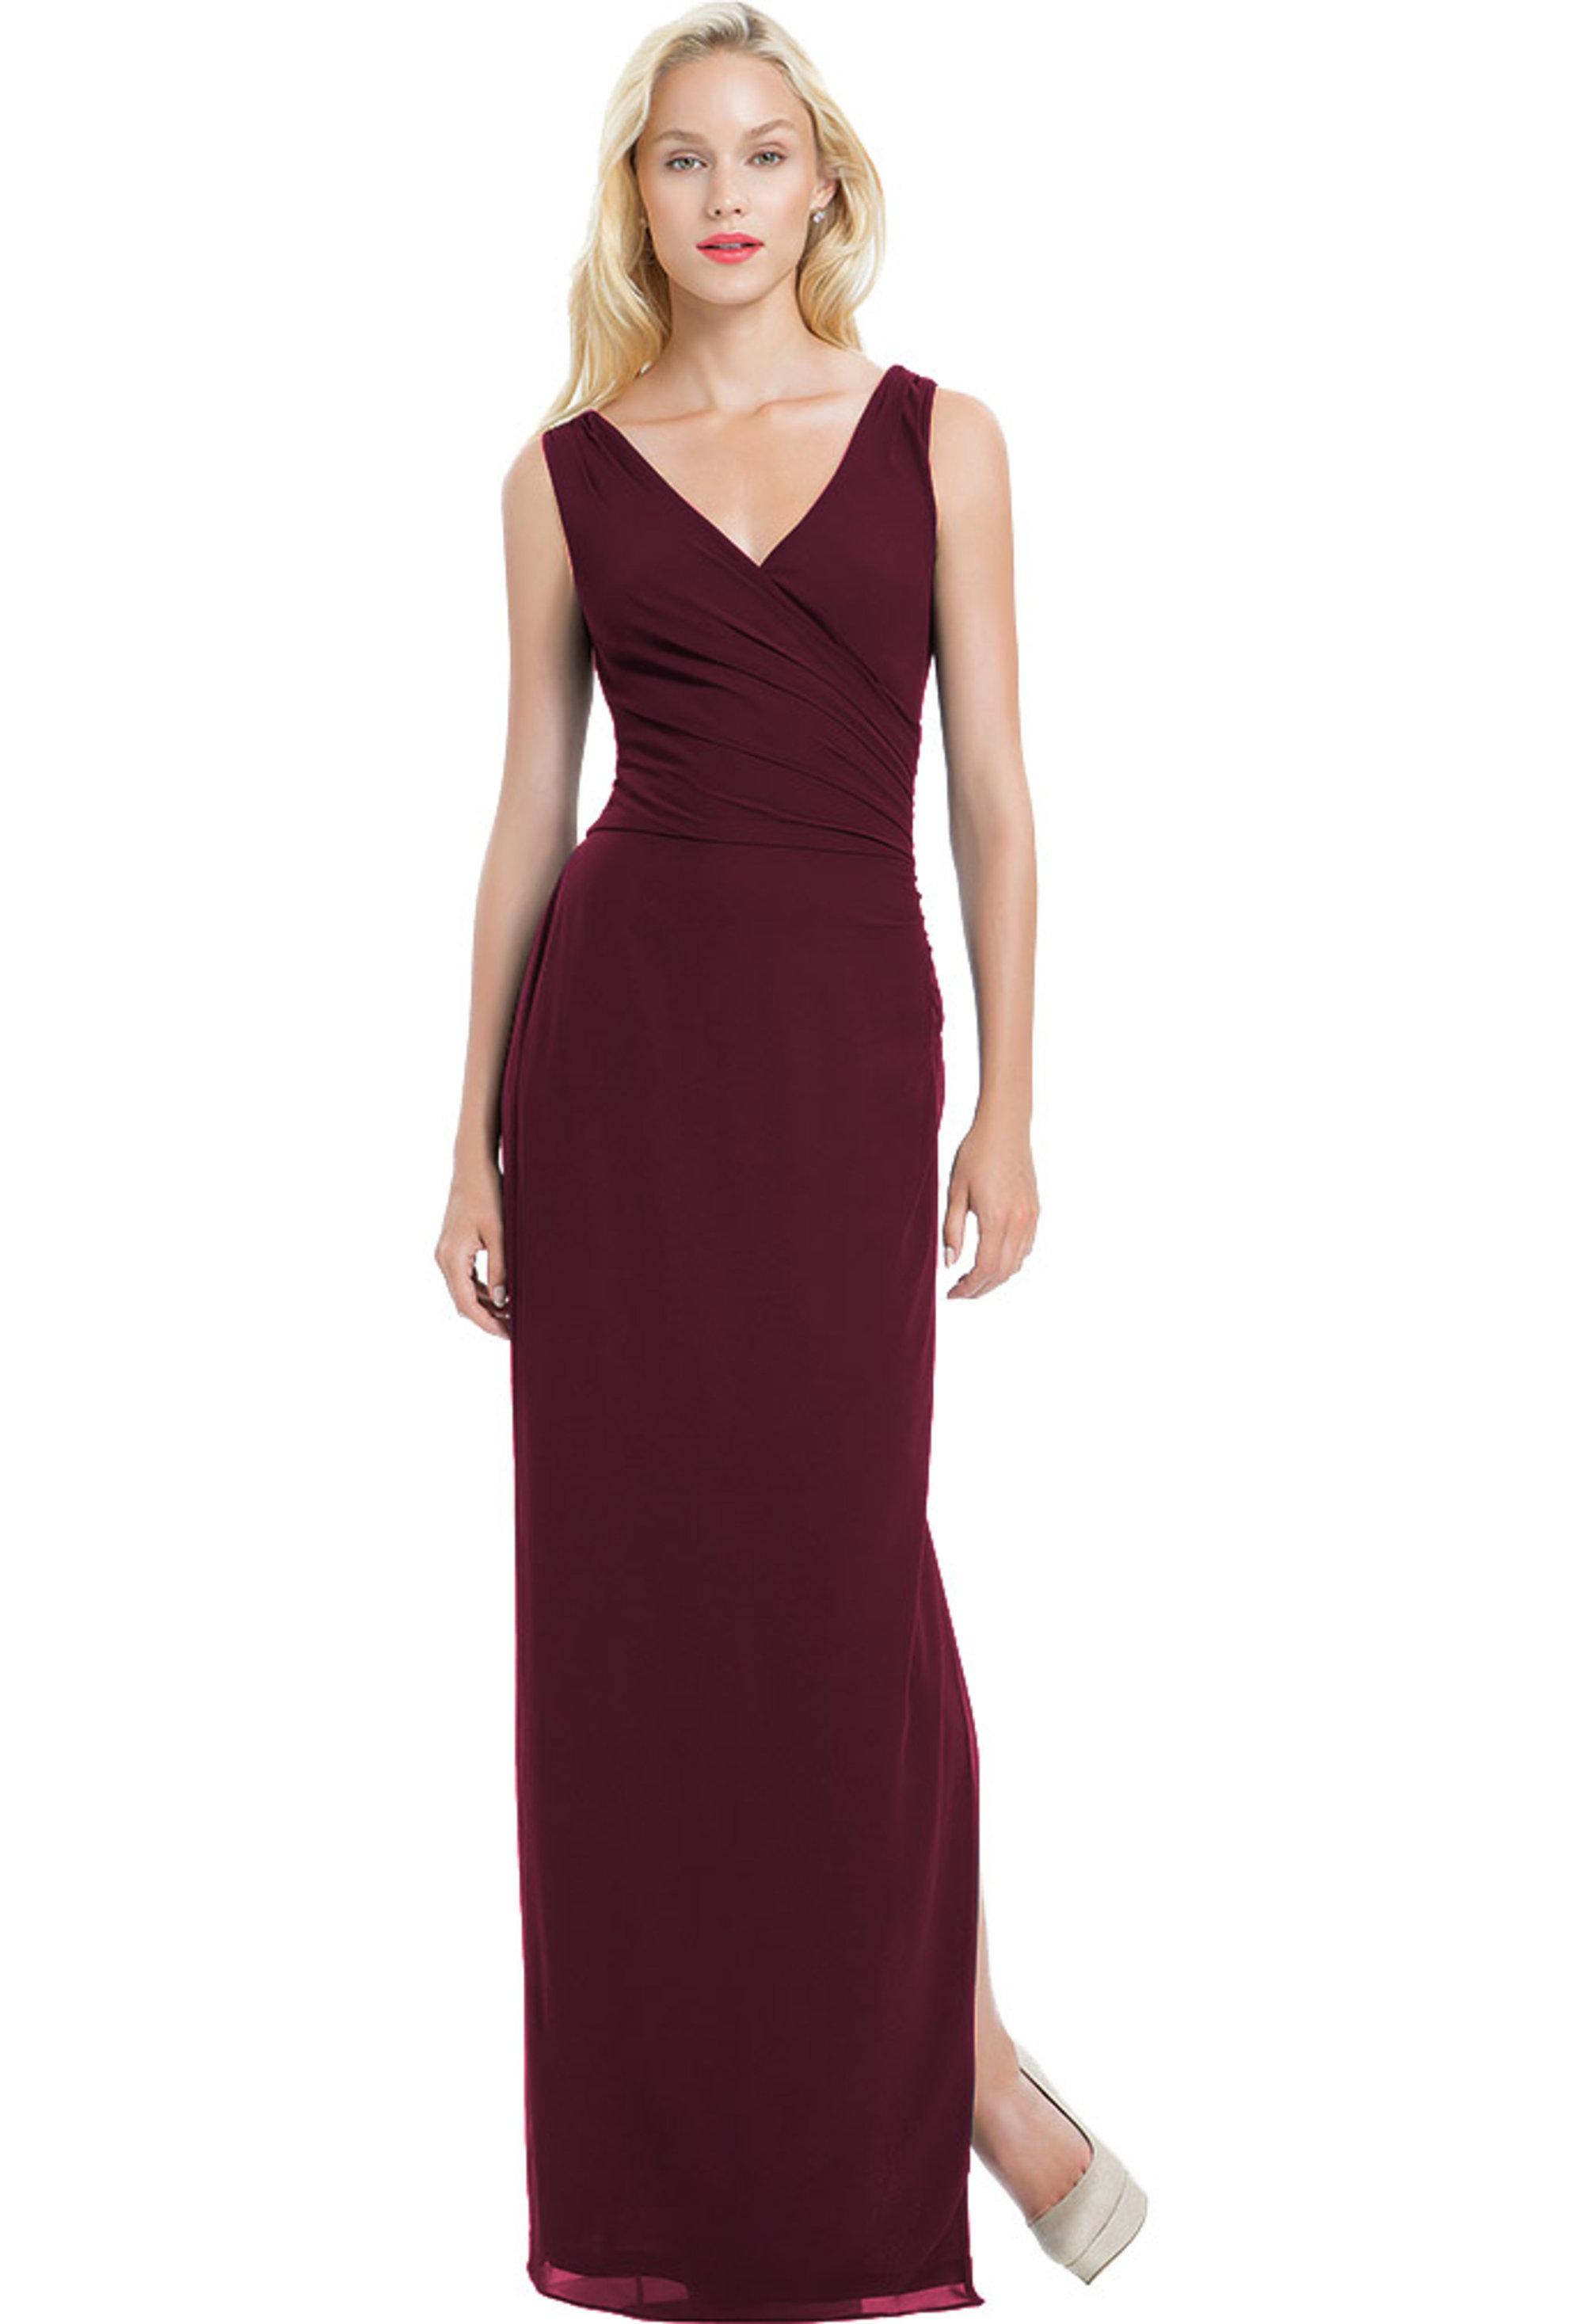 Bill Levkoff WINE Chiffon Sleeveless Side Slit gown, $190.00 Front